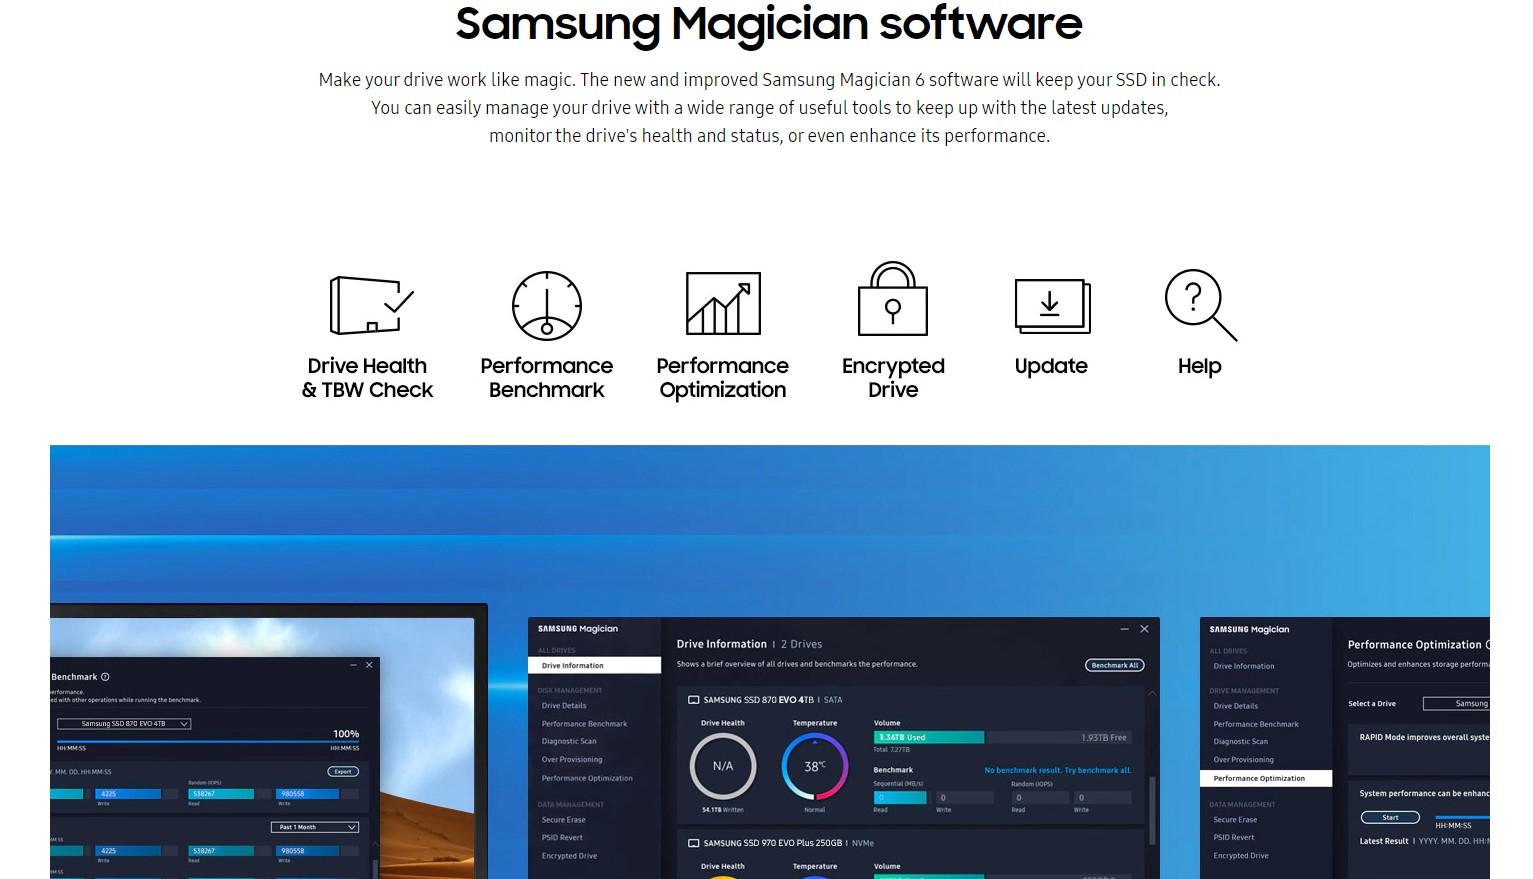 Ổ cứng SSD Samsung 870 EVO 500GB SATA III 6Gbs 2.5 inch